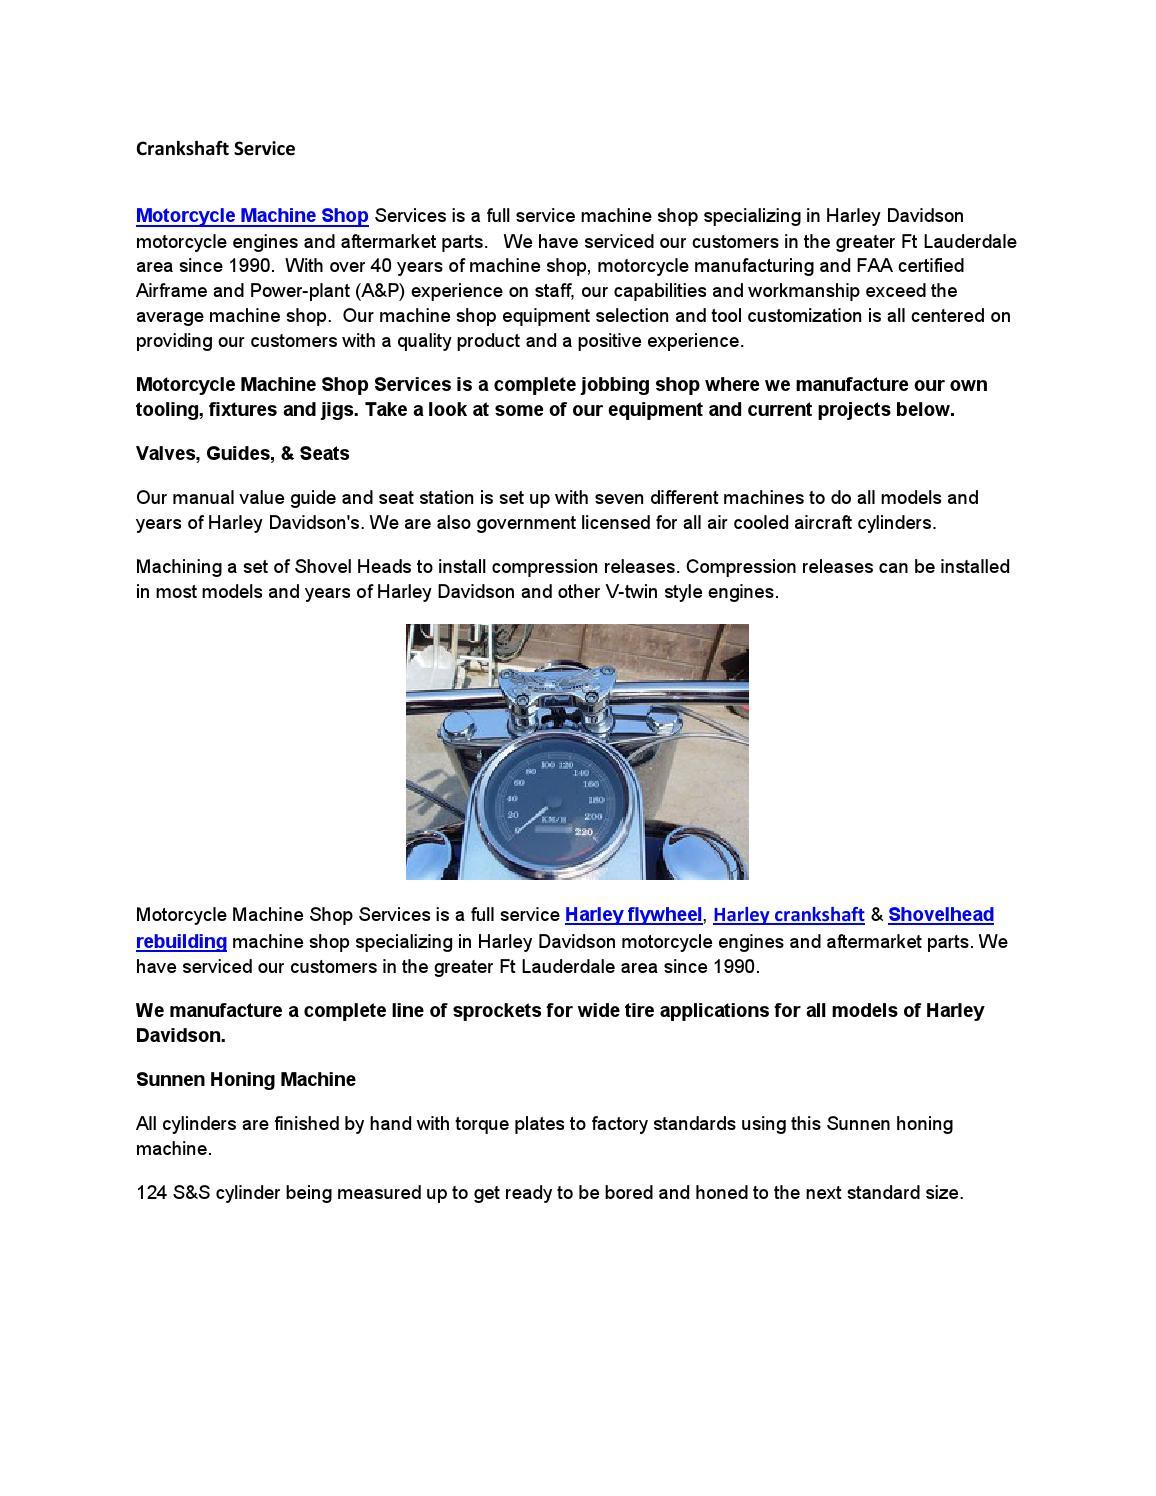 Crankshaft Service By Motorcycle Machine Shop Issuu Harley Engine Parts Diagram